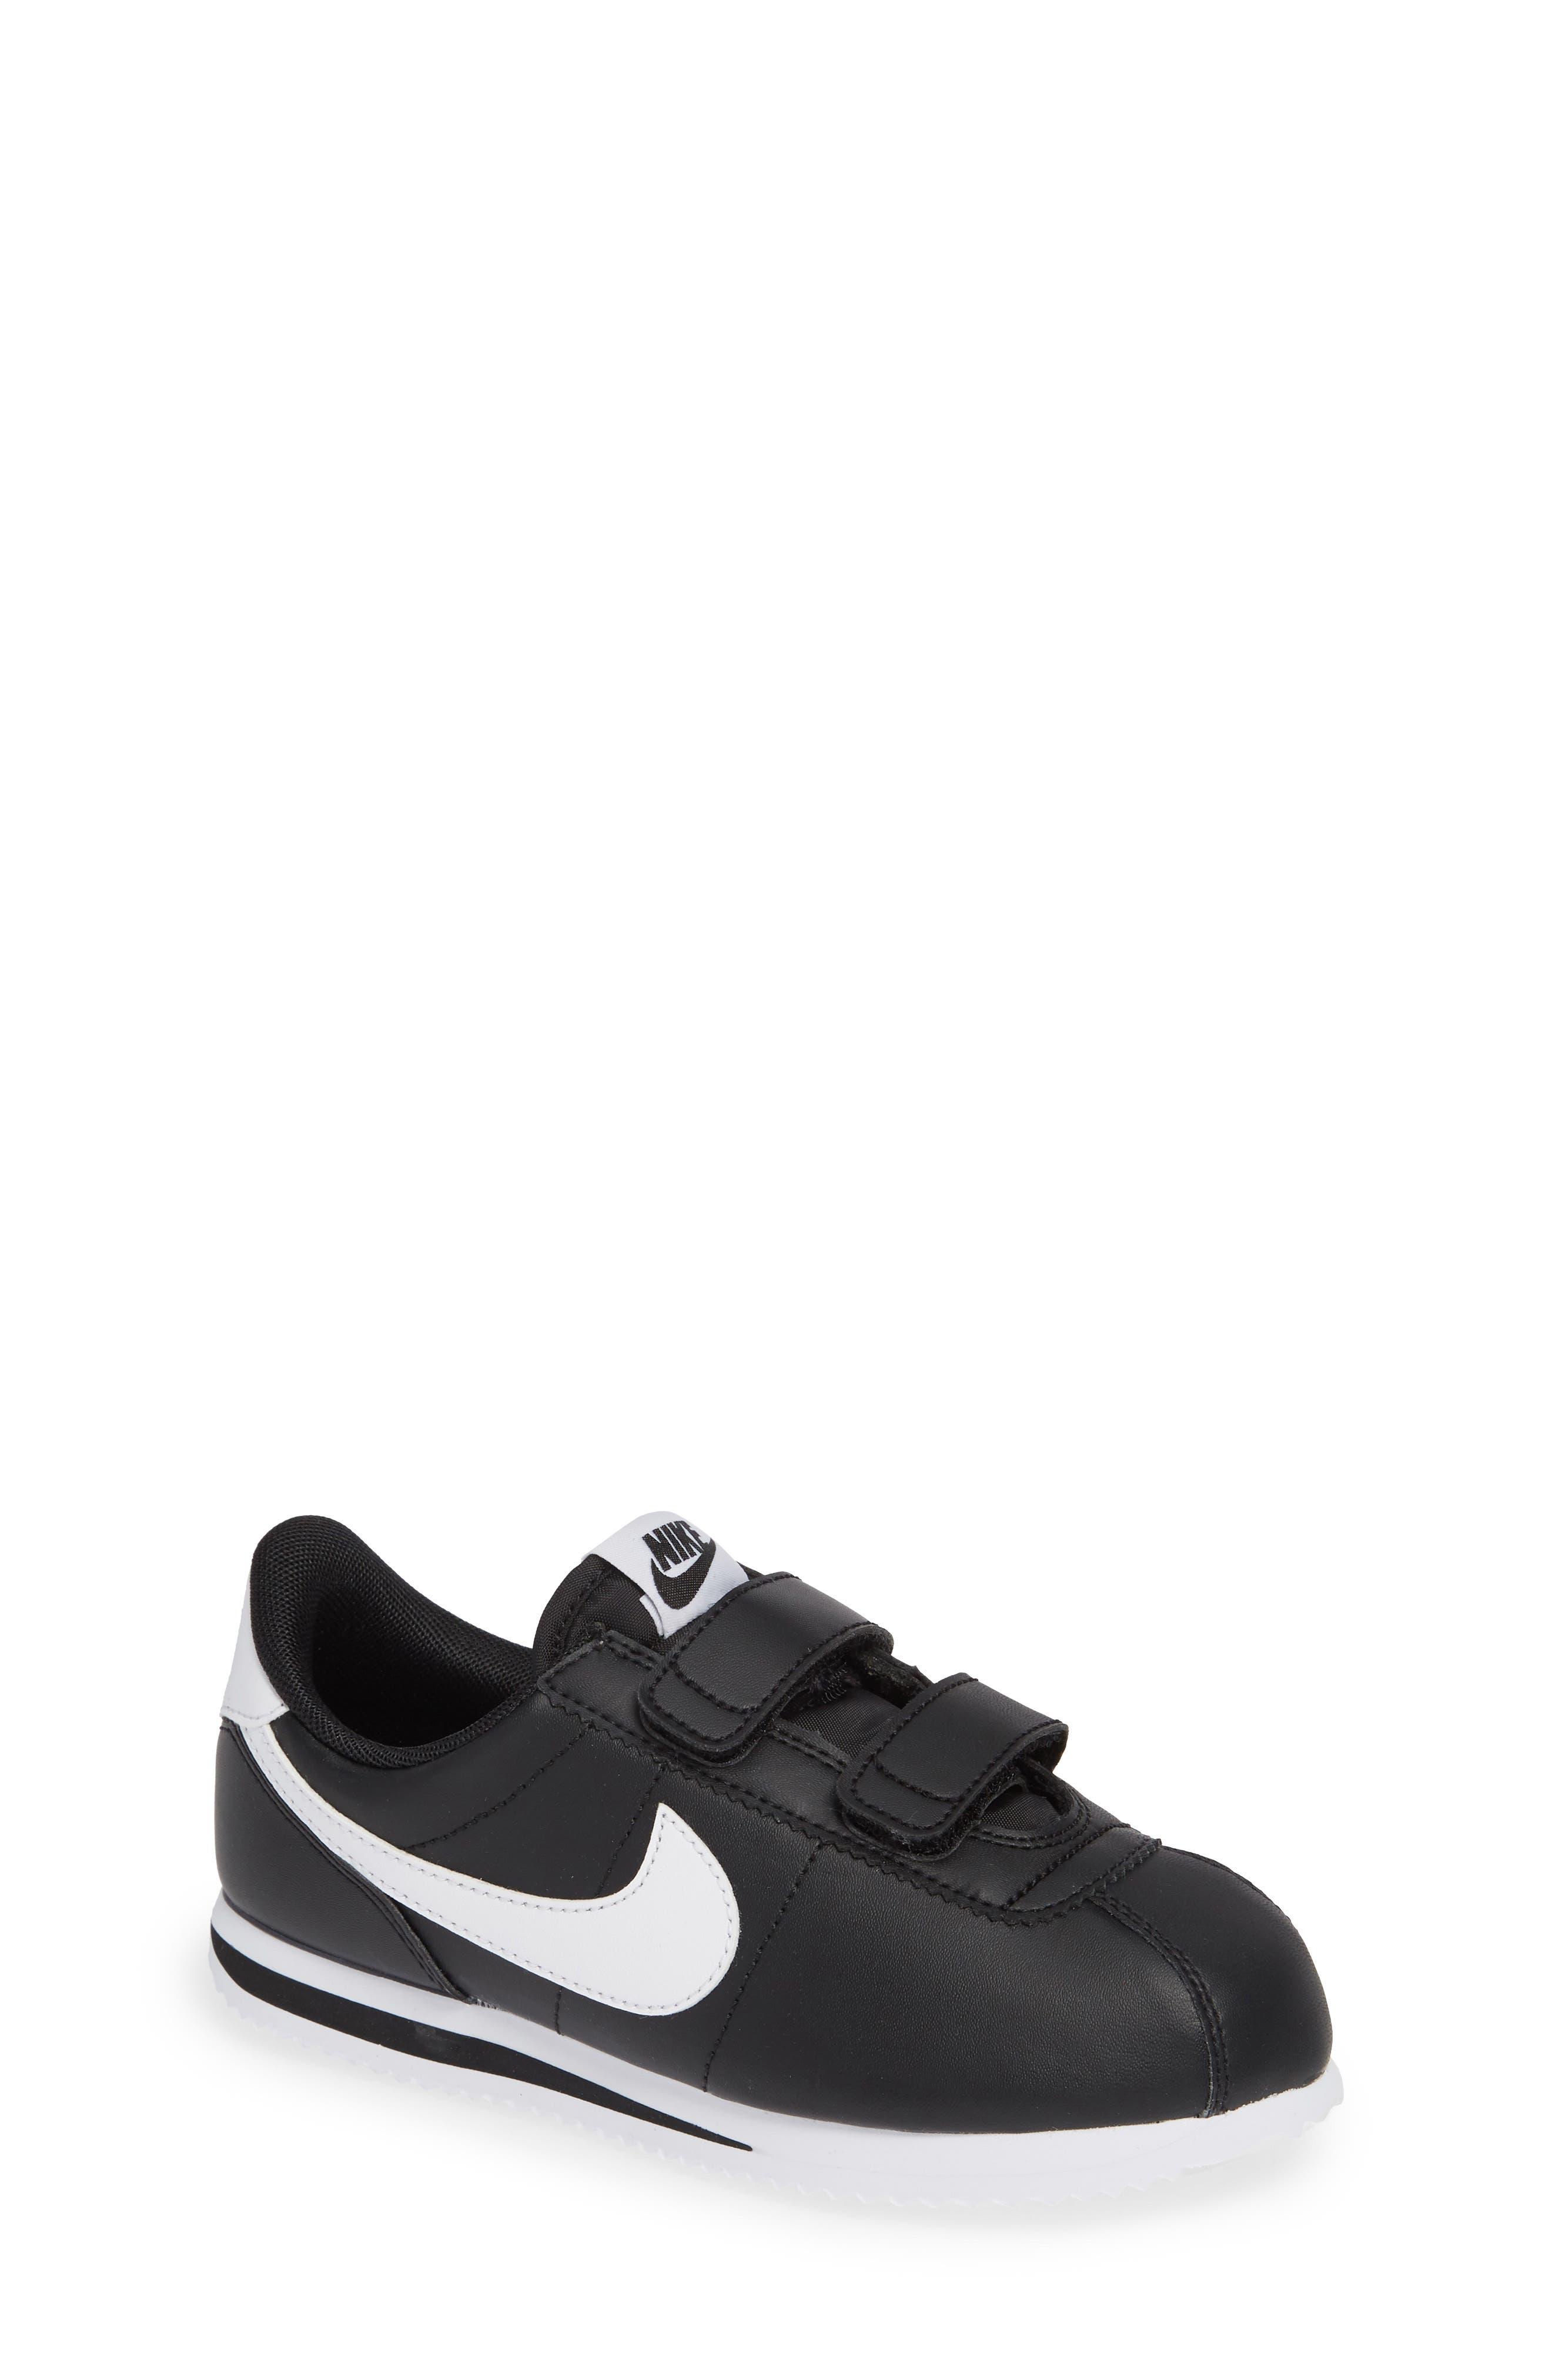 Cortez Basic SL Sneaker,                         Main,                         color, Black/ White